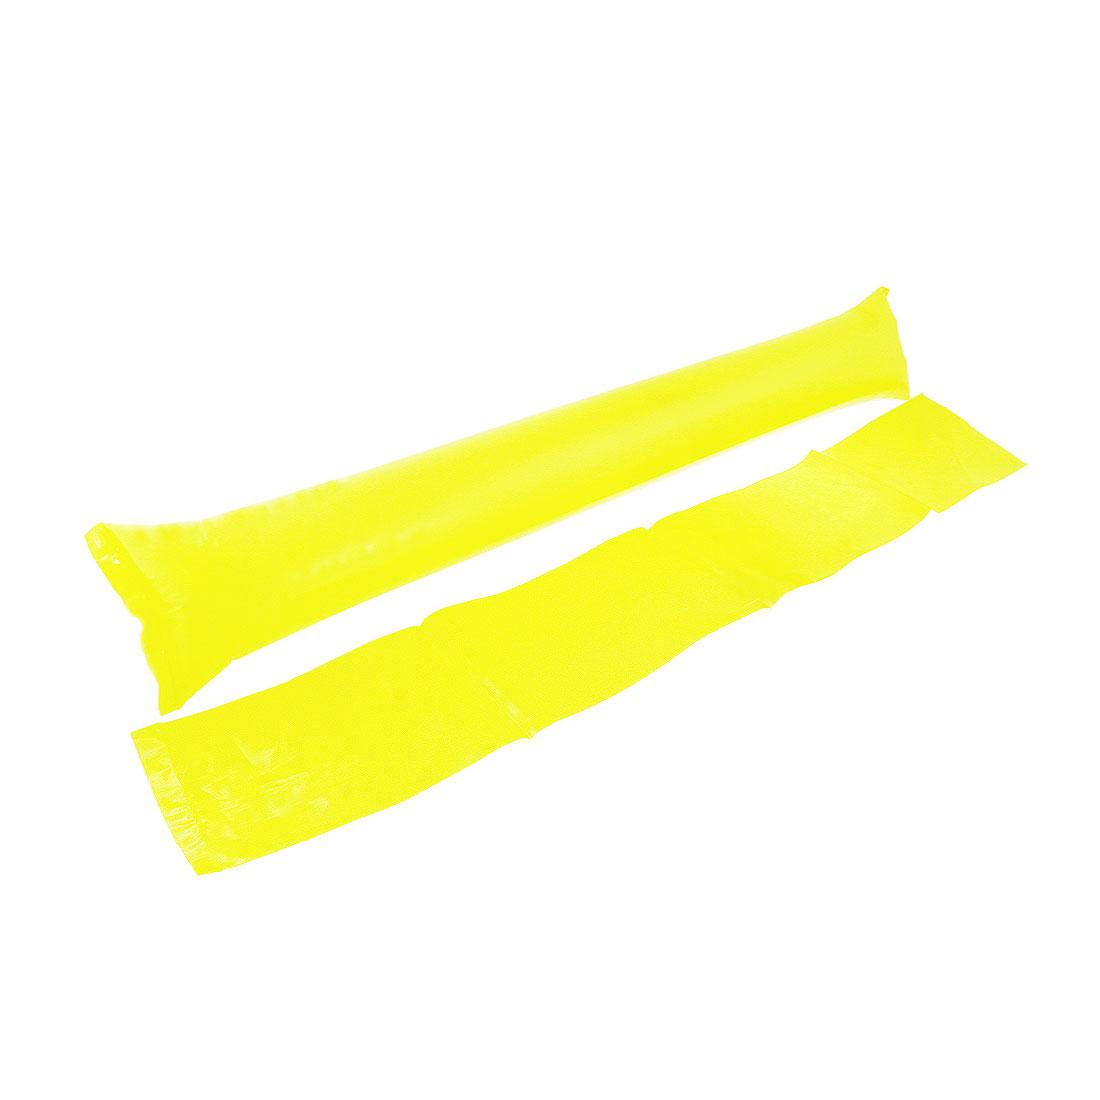 5 Pairs Plastic Inflatable Match Cheer Balloons Bang Bar Stick Yellow